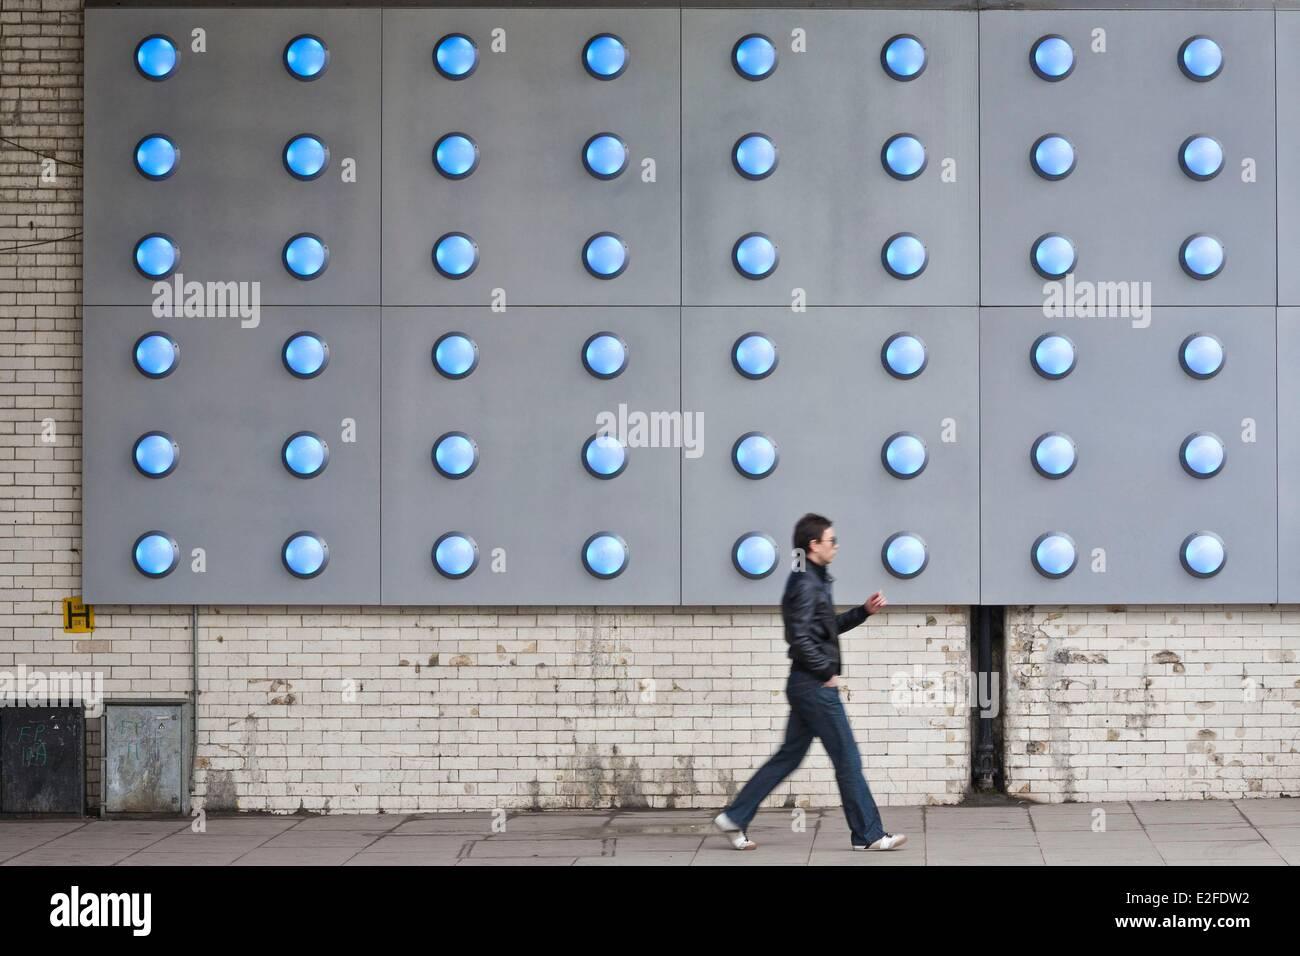 United Kingdom, London, Southwark, Bankside, Southwark Street, installation art since 2008 - Stock Image